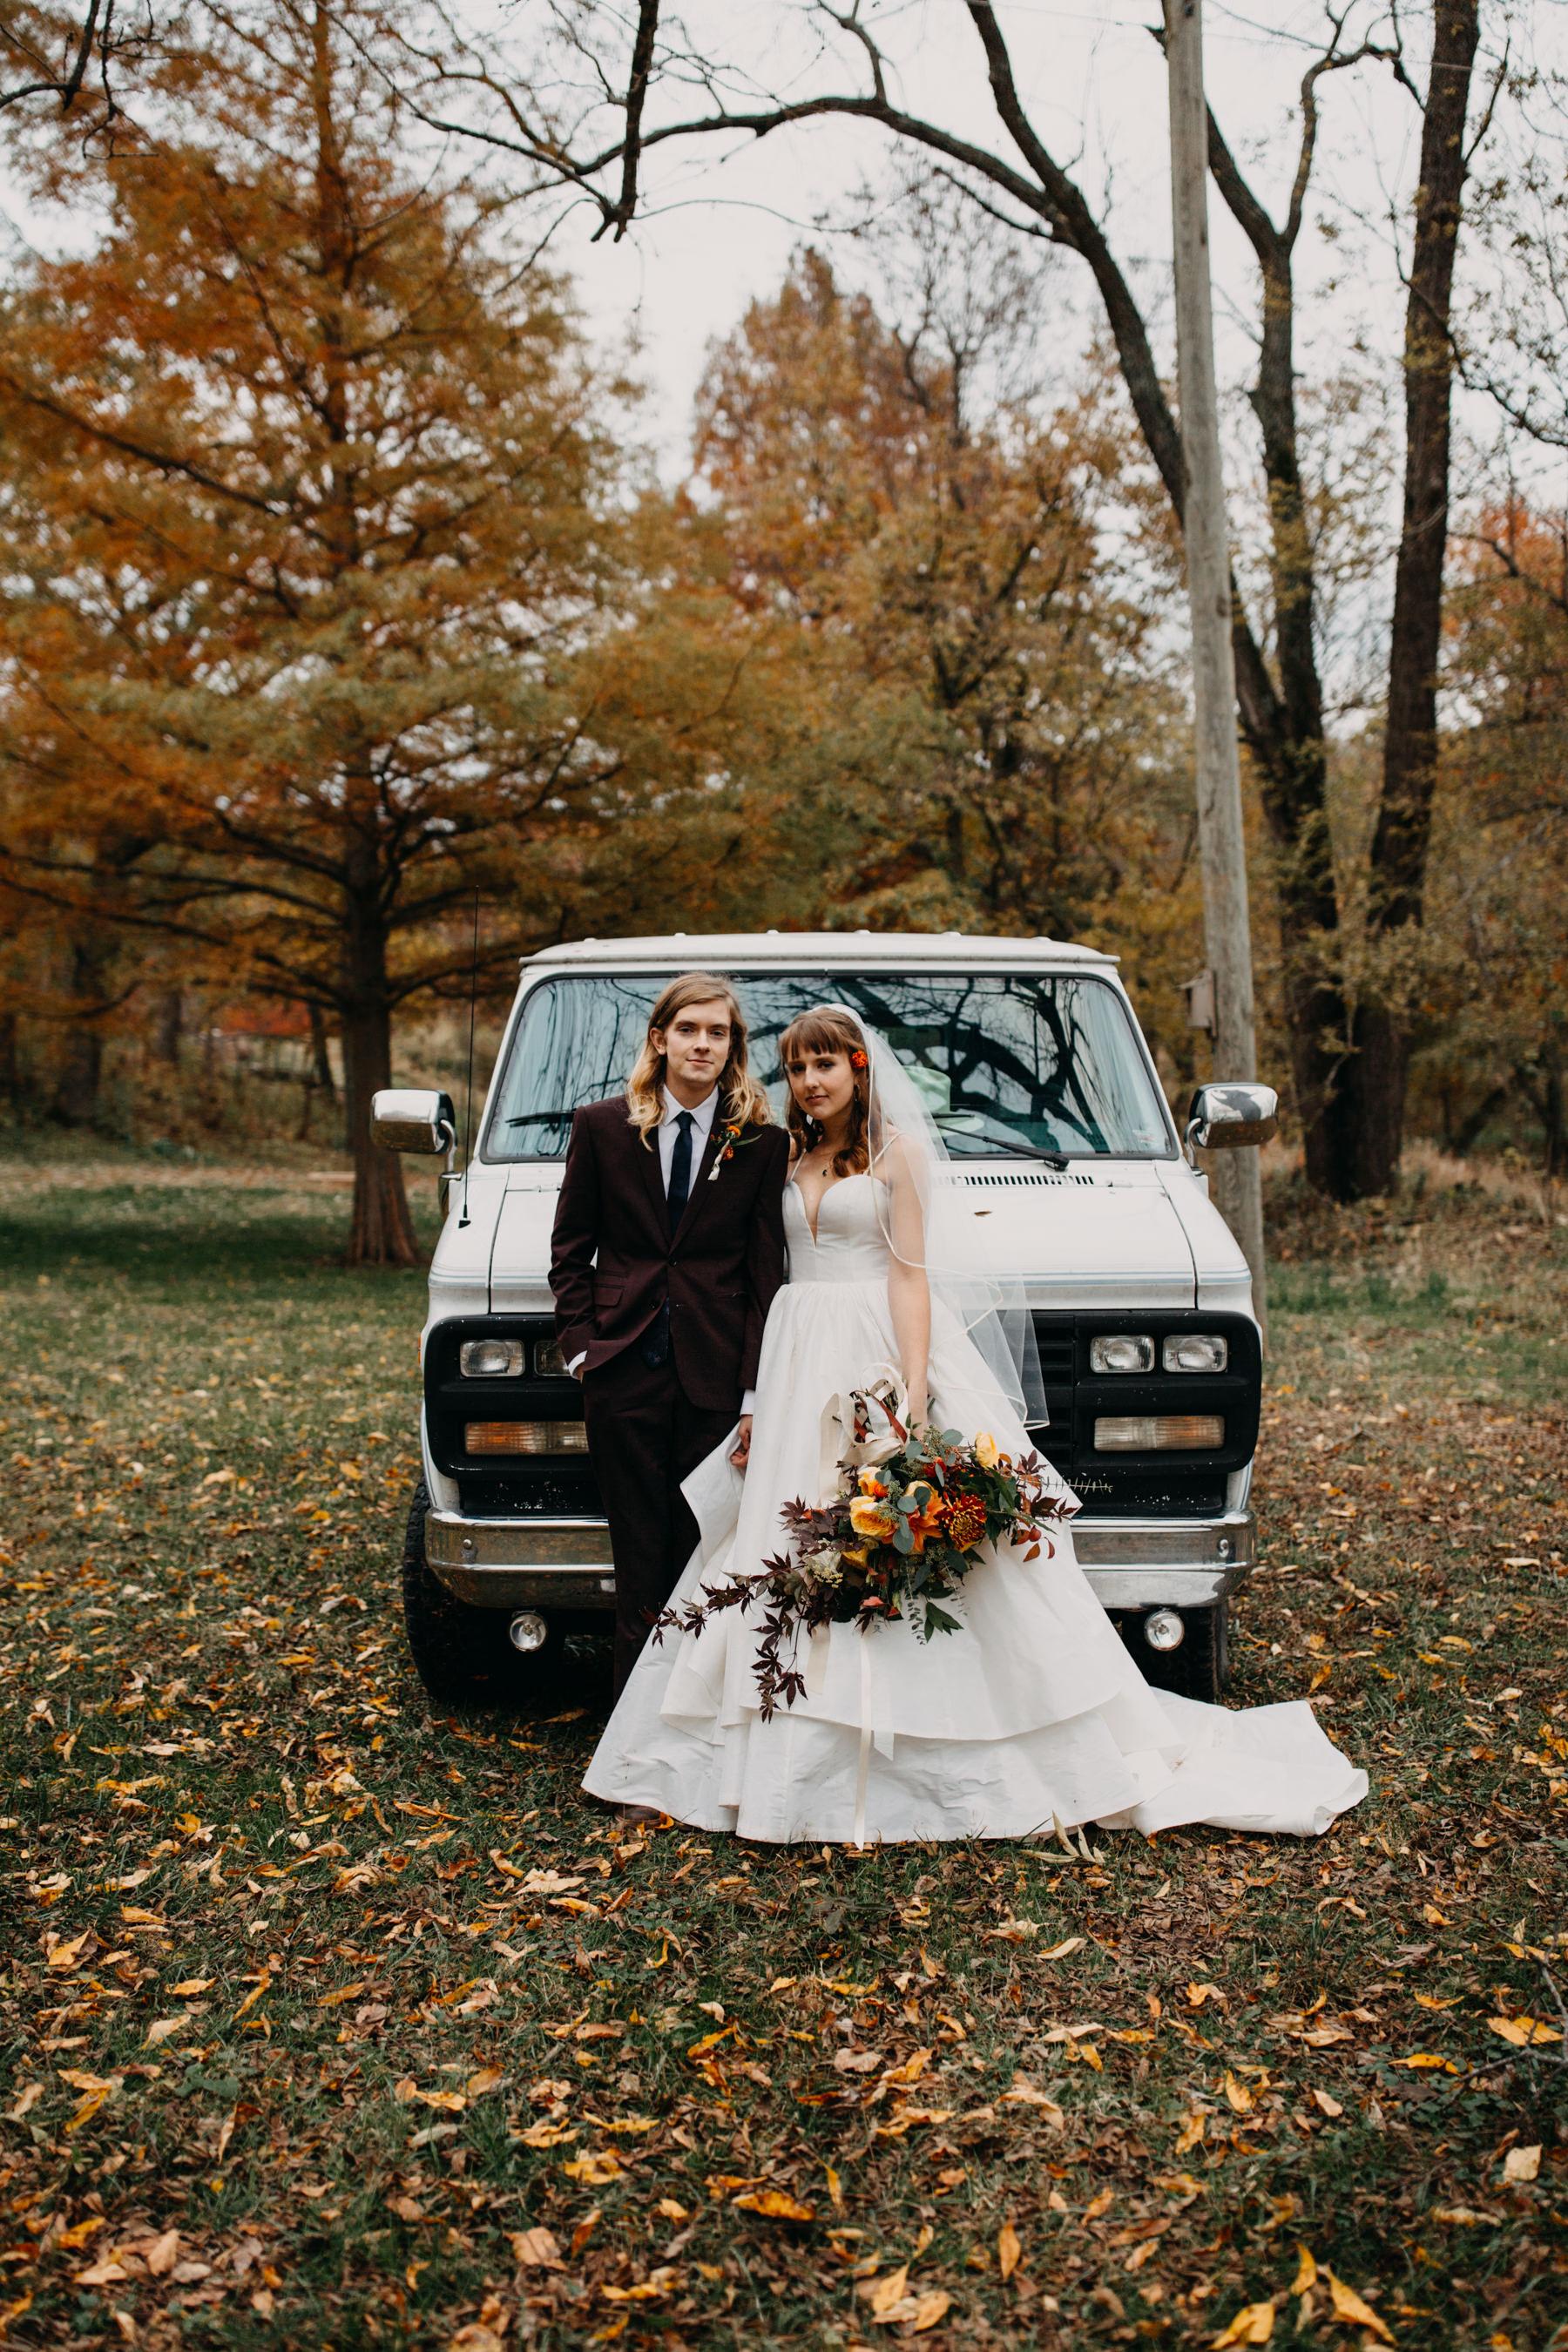 vw van at wedding